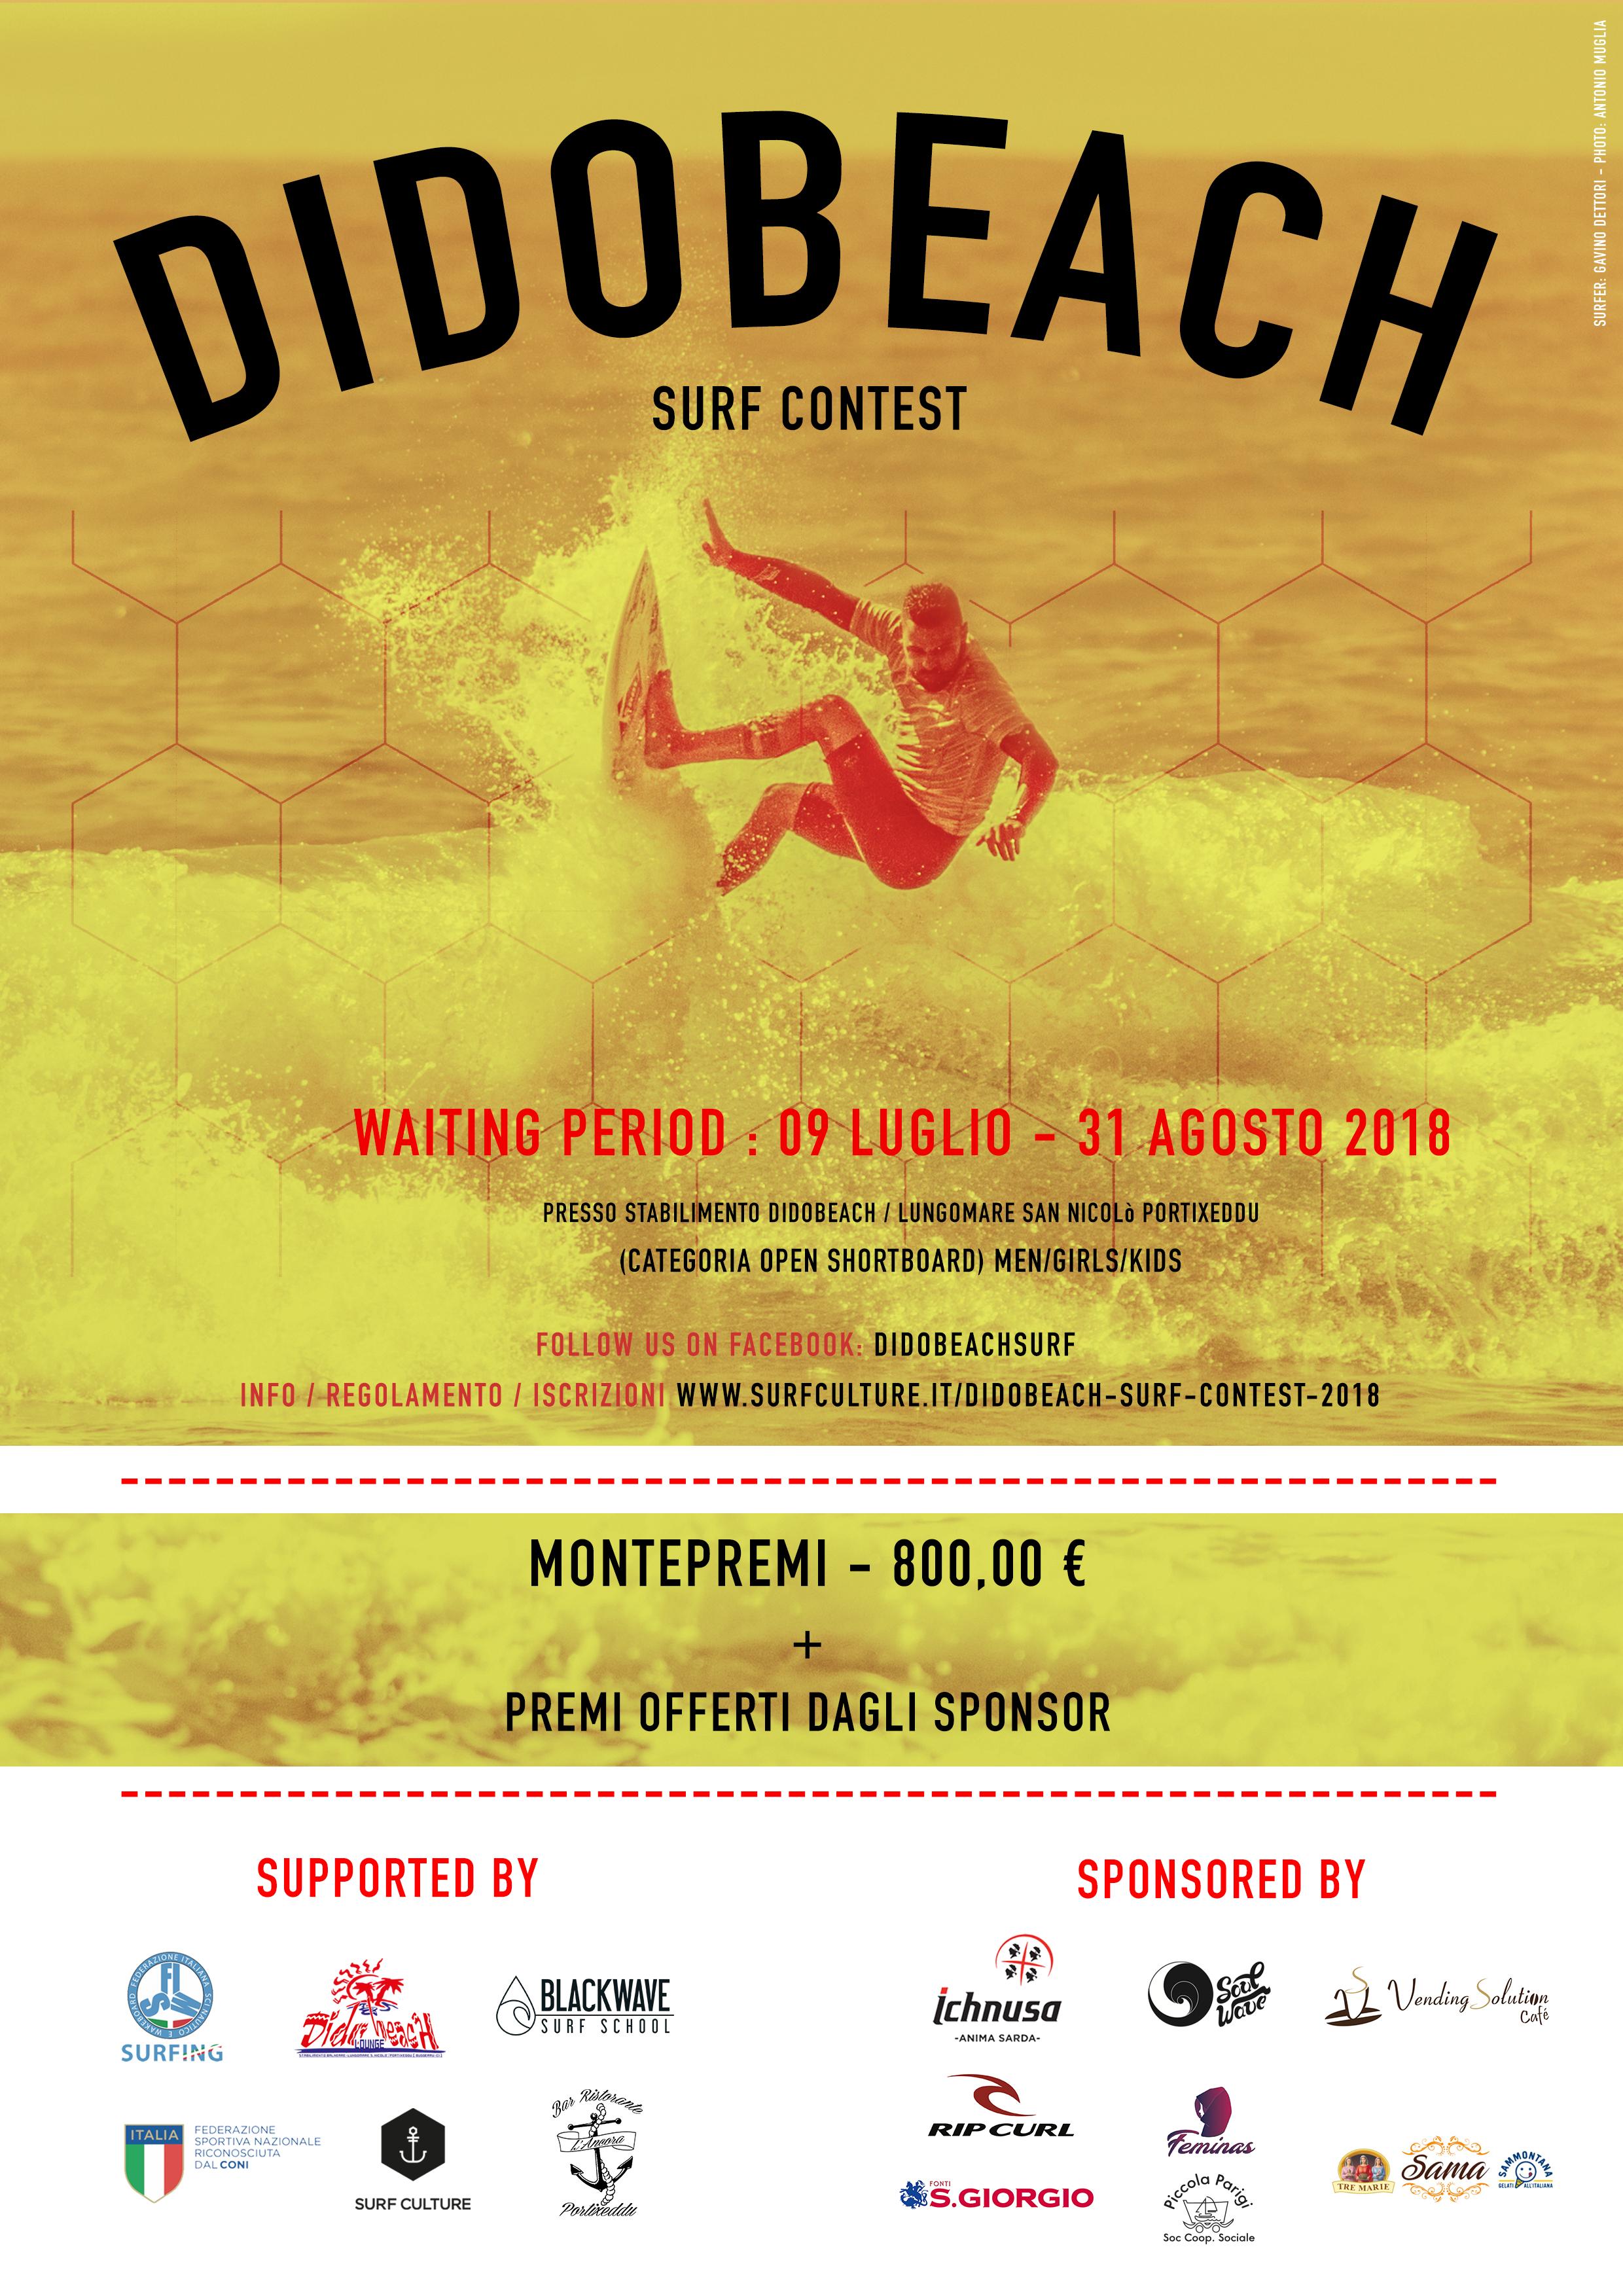 didobeach-surf-contest-2018